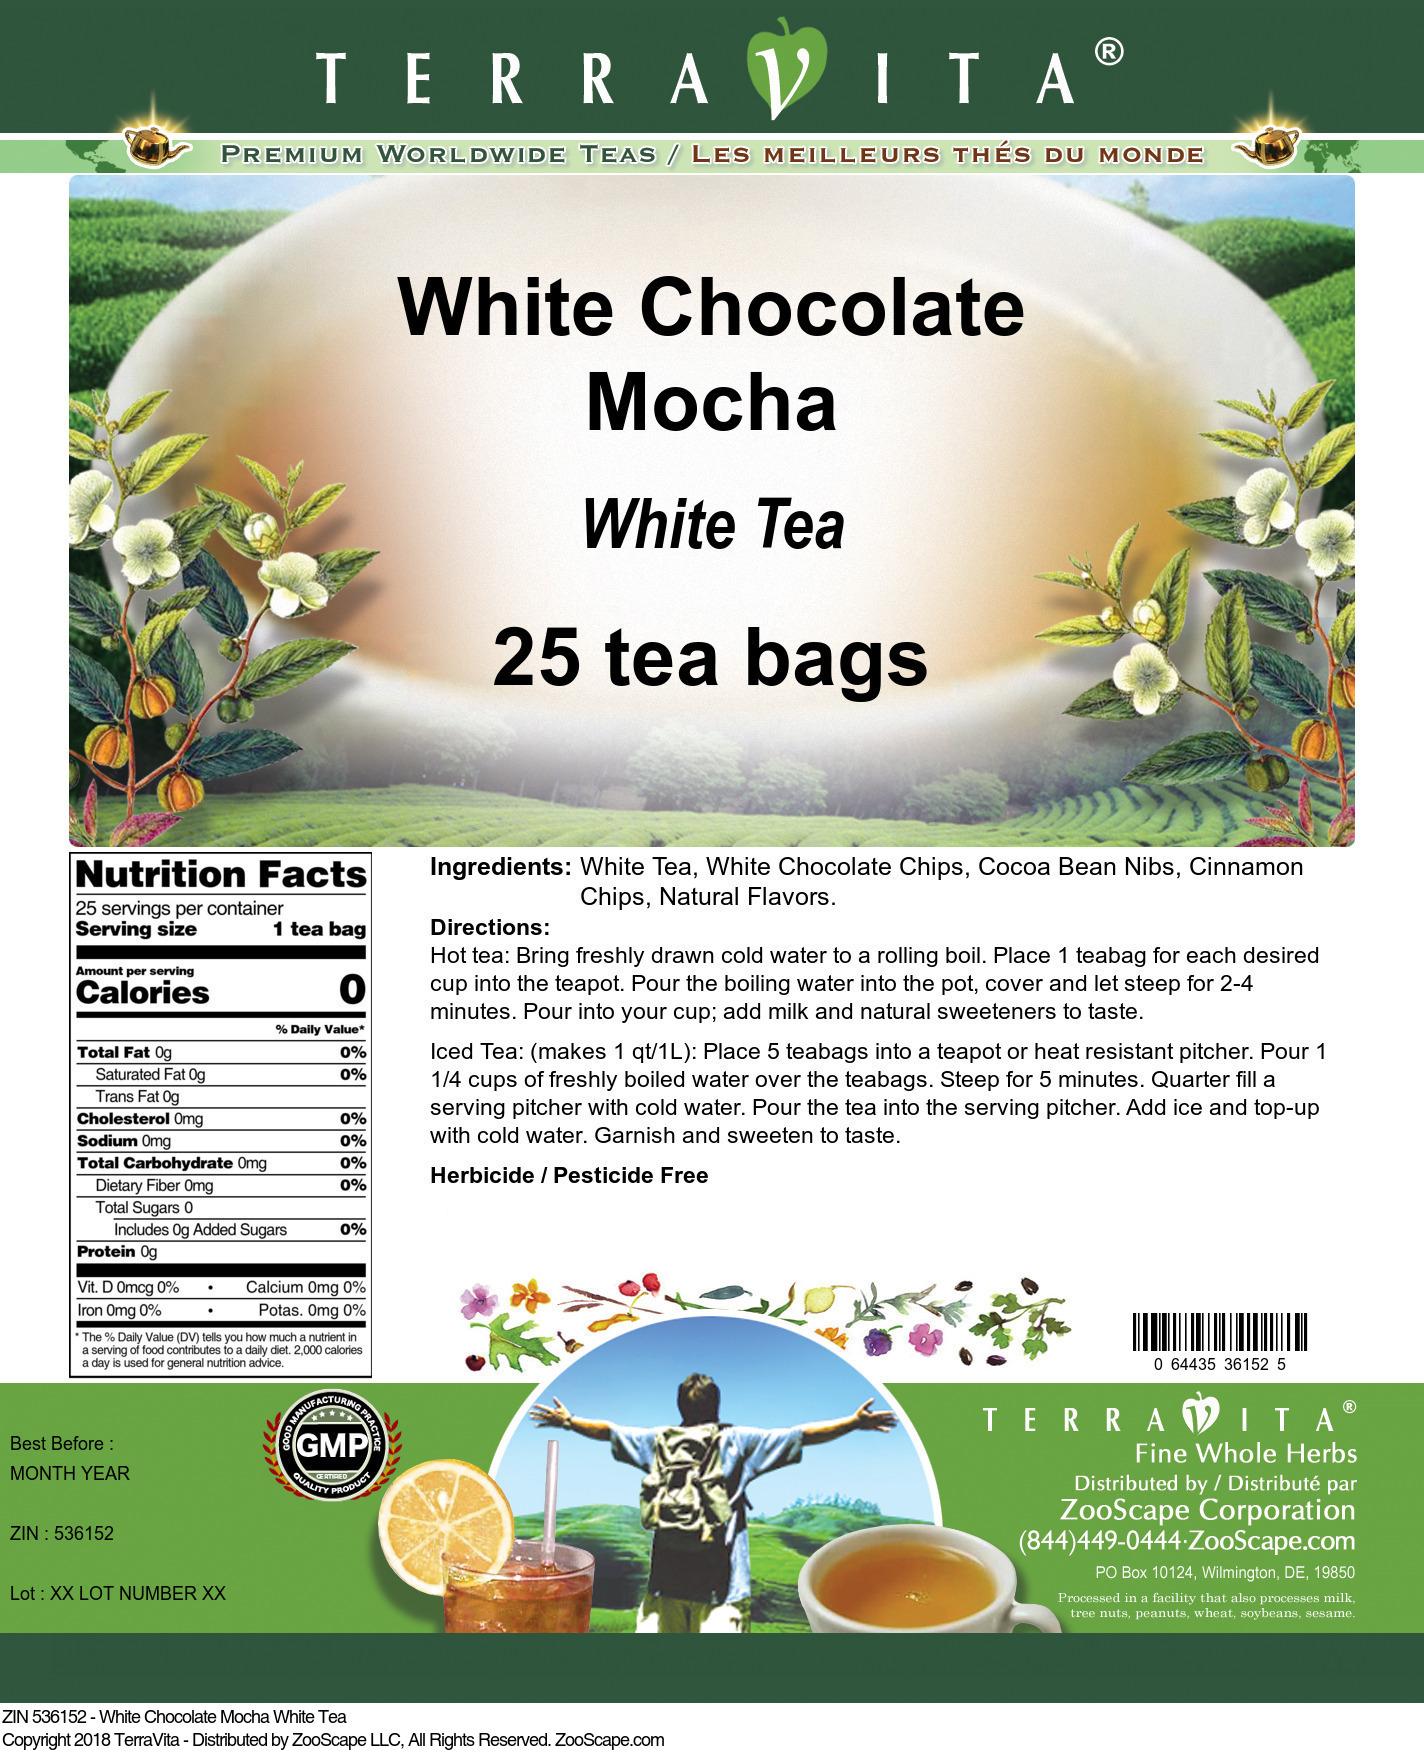 White Chocolate Mocha White Tea